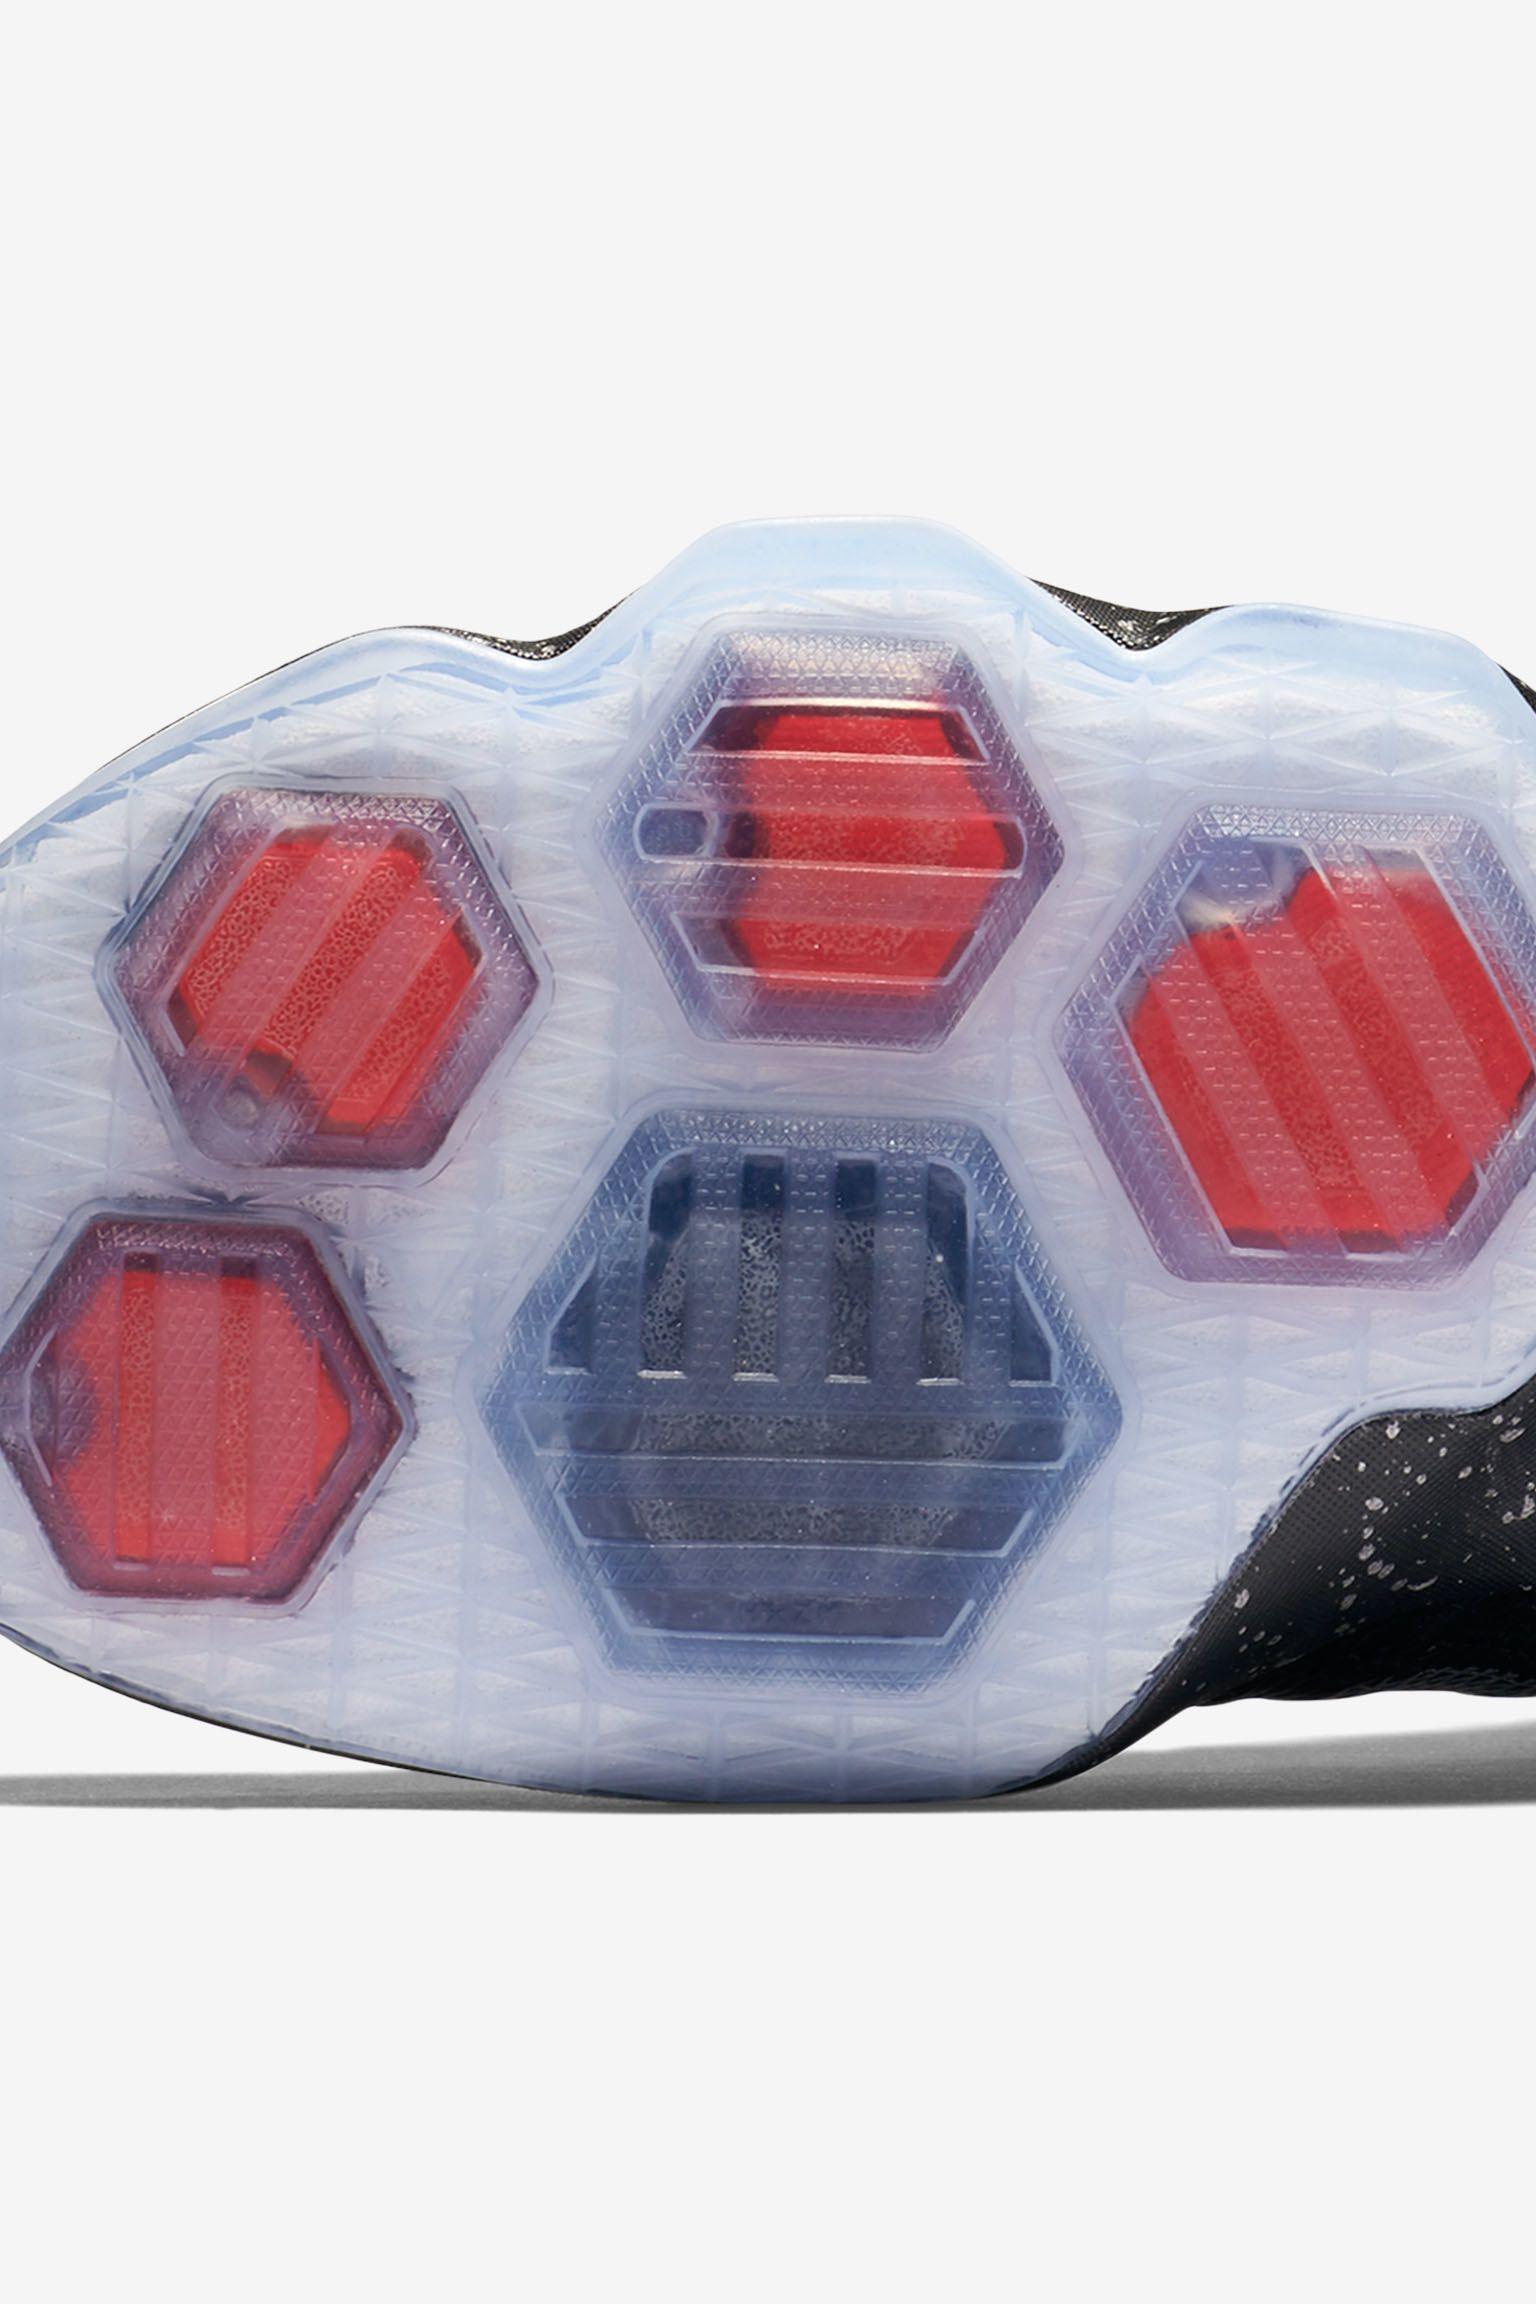 Nike Lebron 13 Elite 'Ready To Battle' Release Date